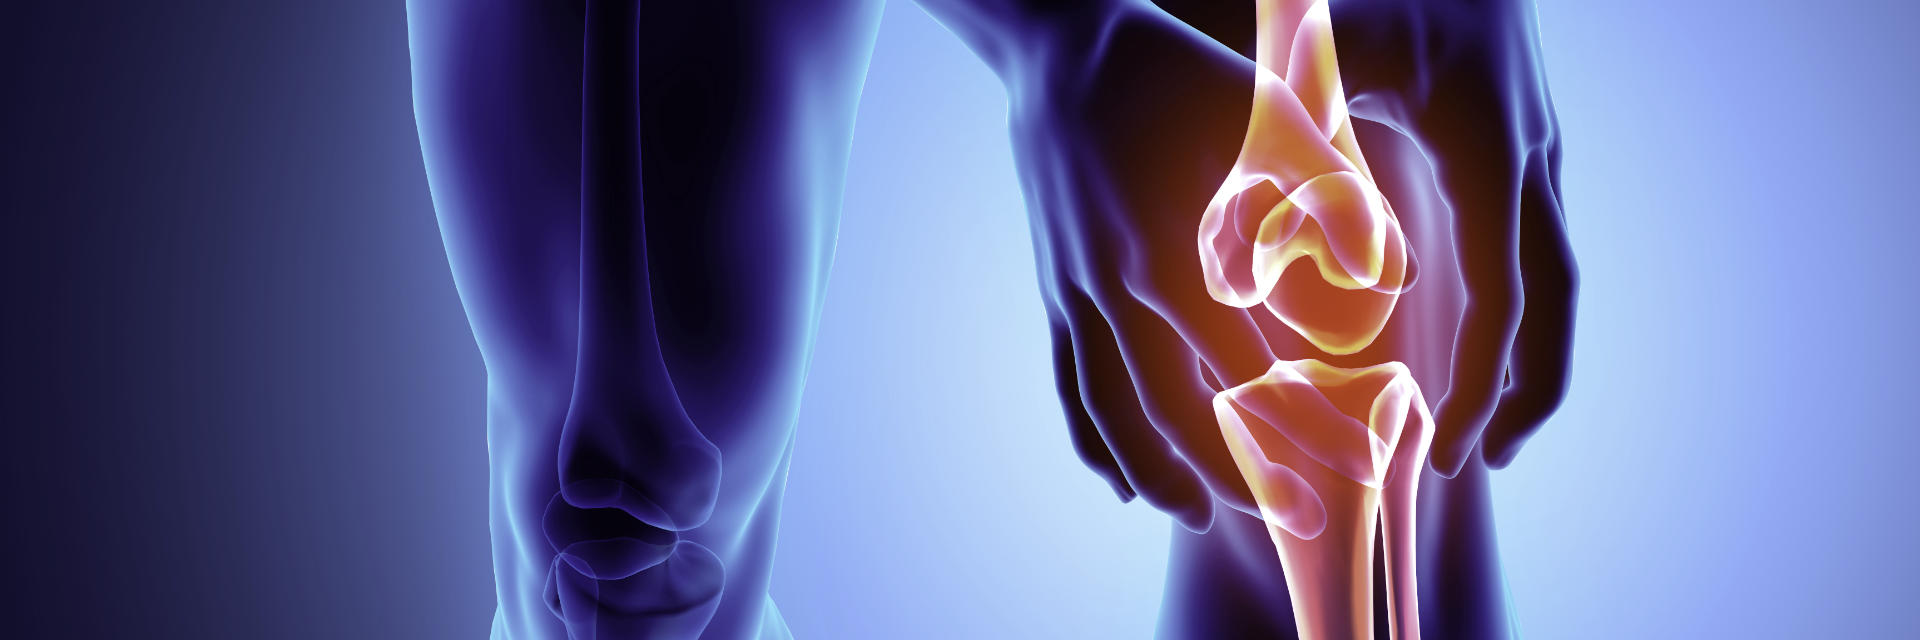 Knee joint with torn meniscus requiring arthroscopy for meniscus repair.